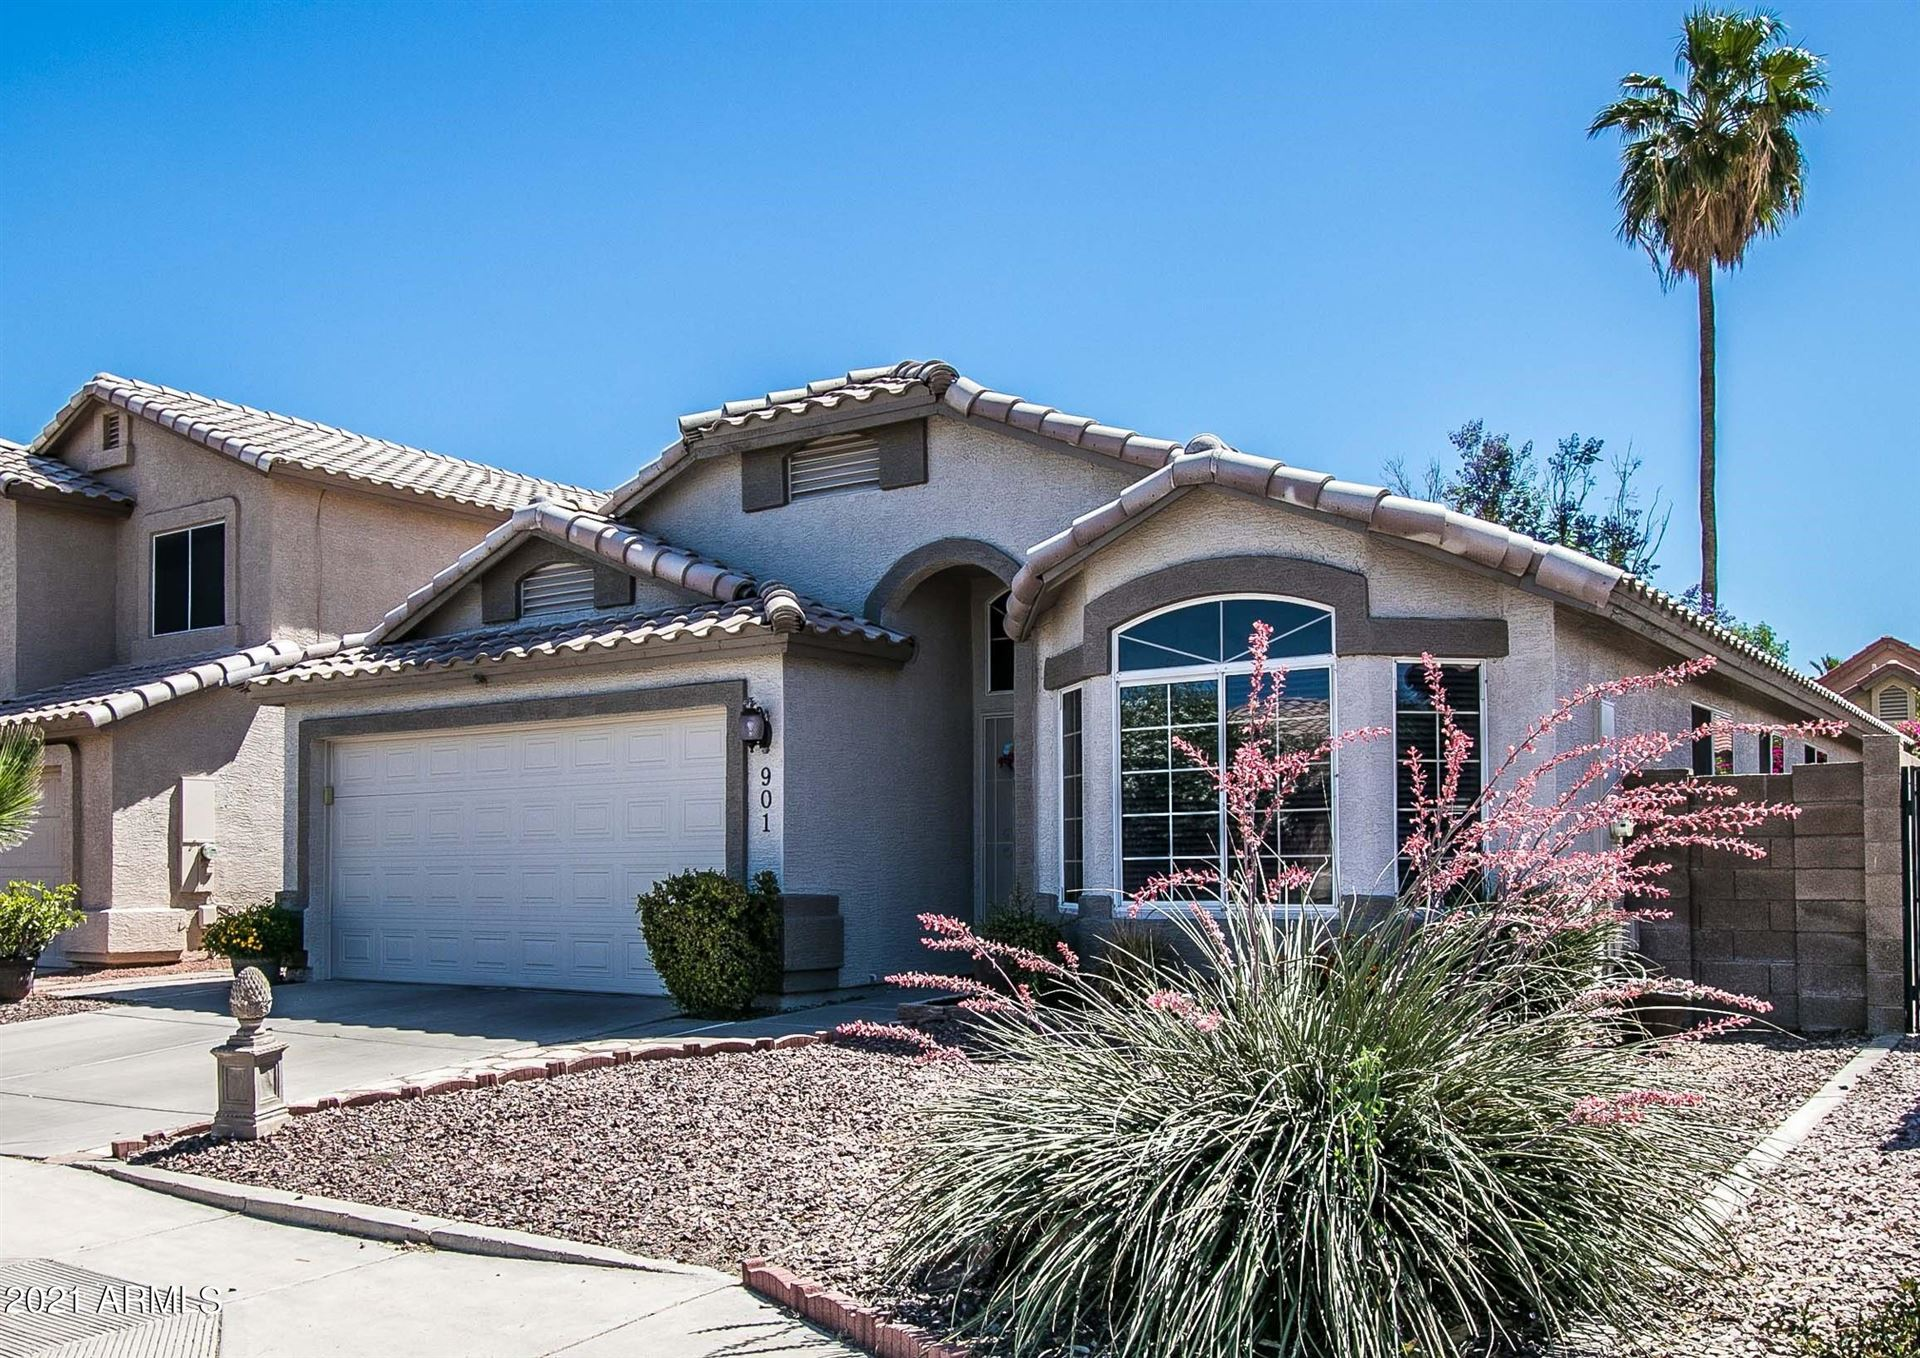 Photo of 901 N ALBERT Drive, Chandler, AZ 85226 (MLS # 6234028)